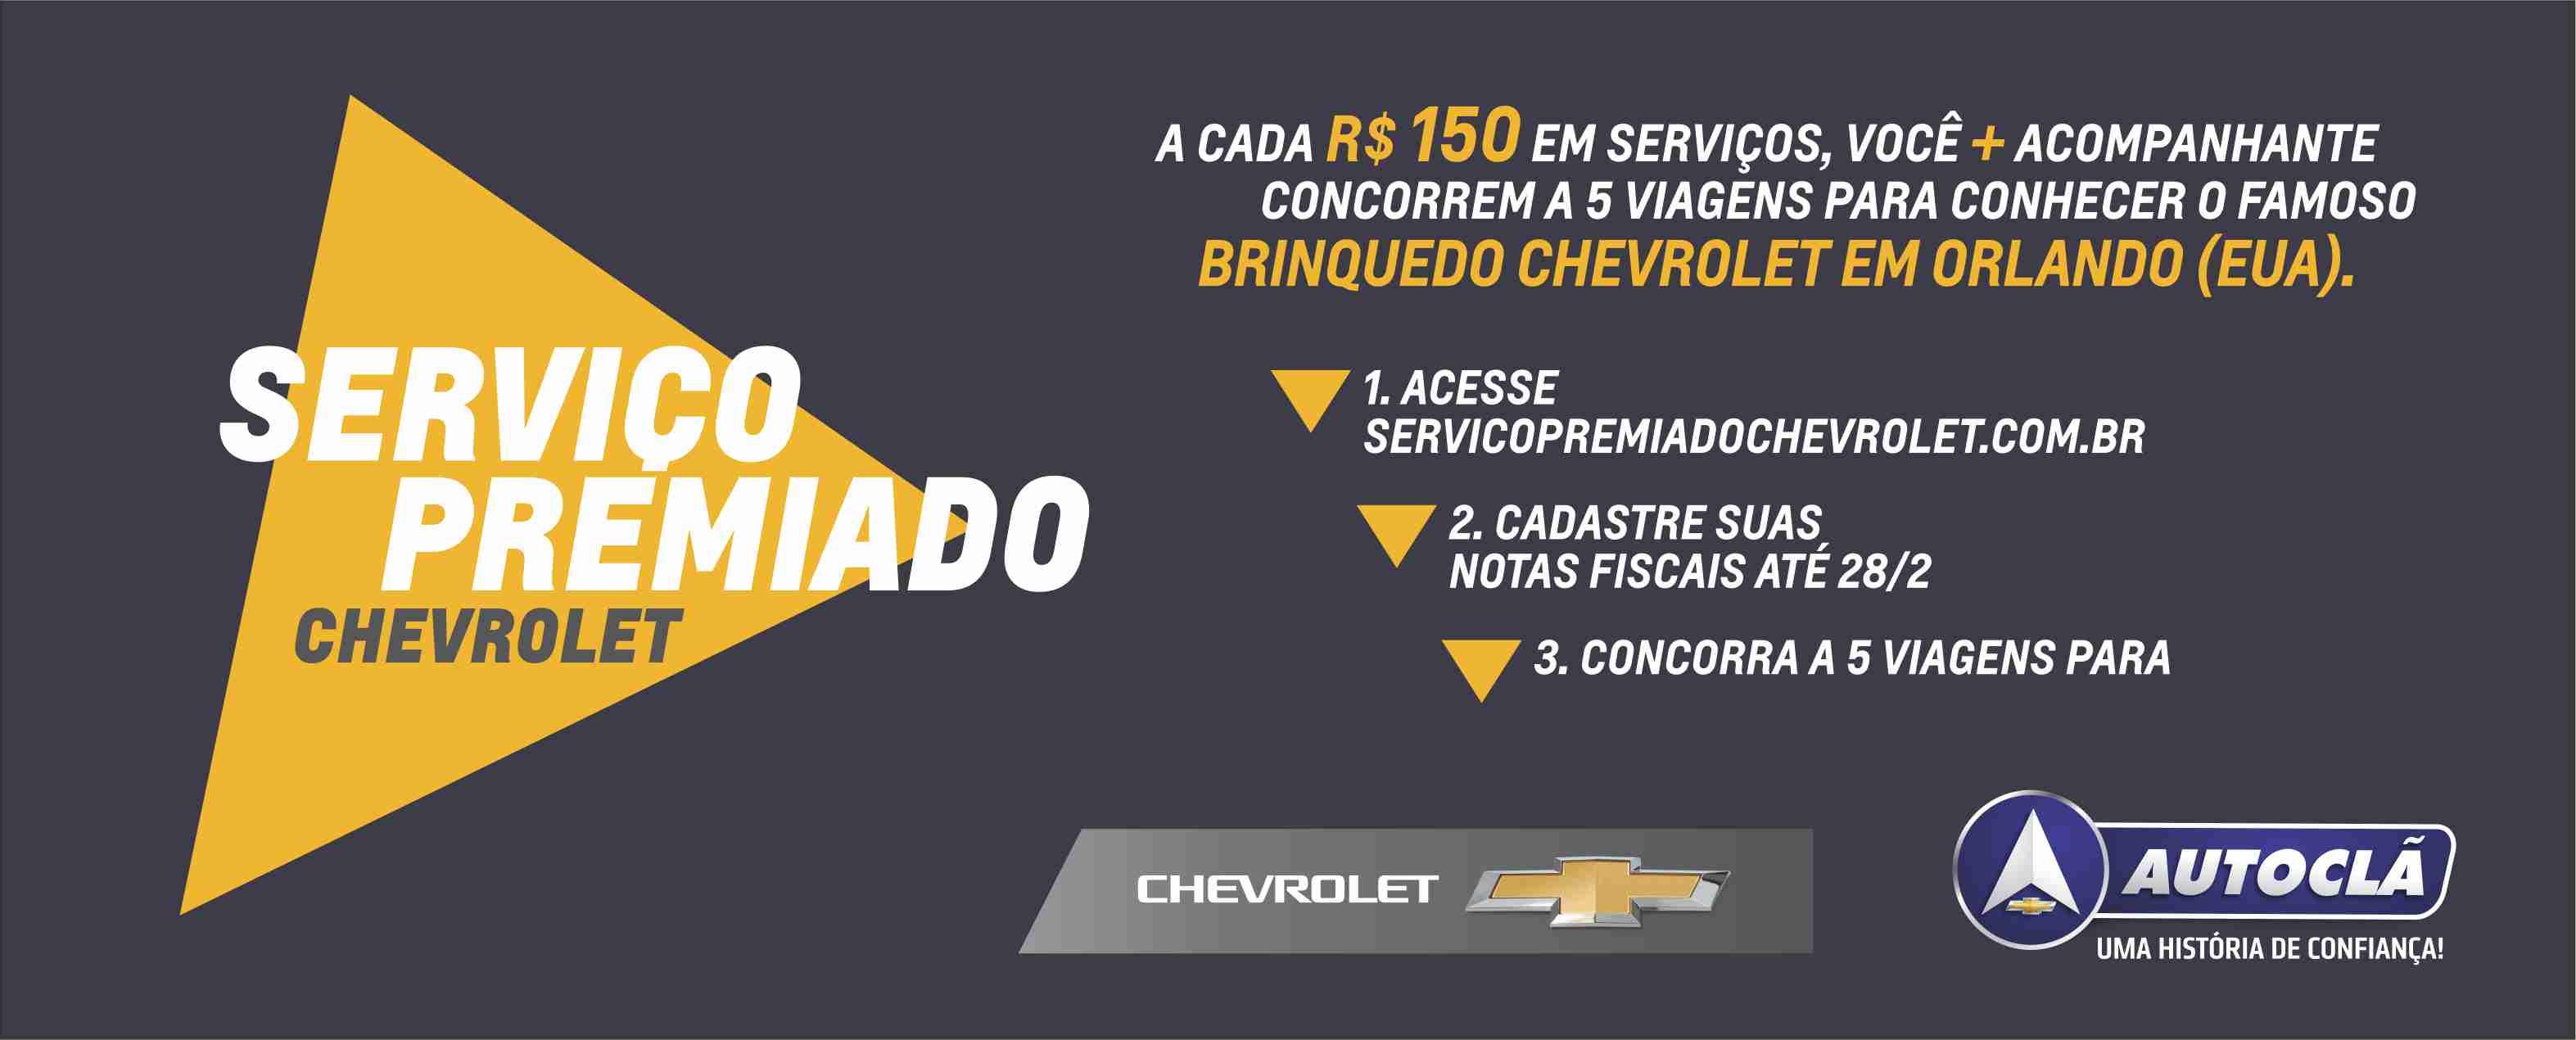 SERVICO PREMIADO site